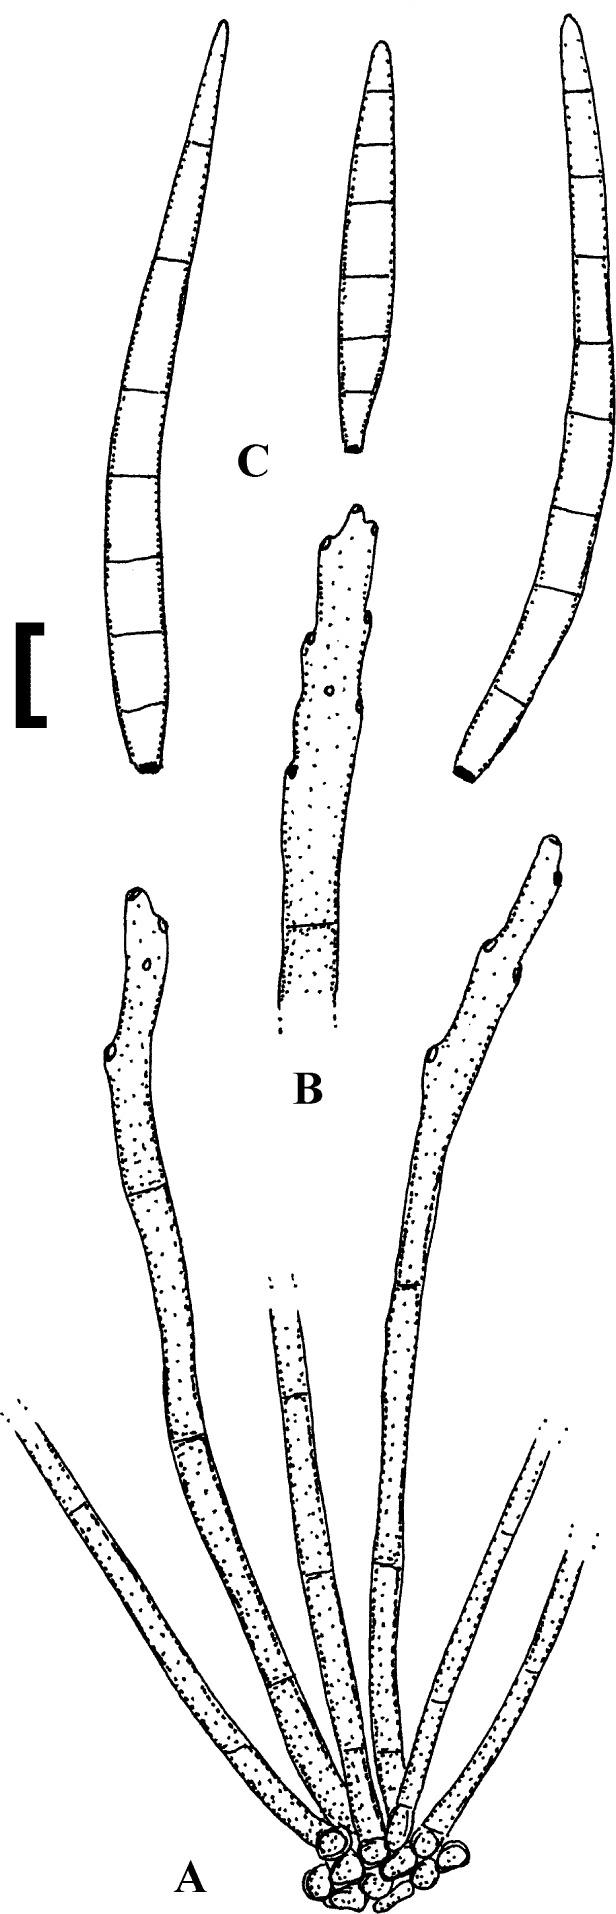 torulosum helminthosporium)